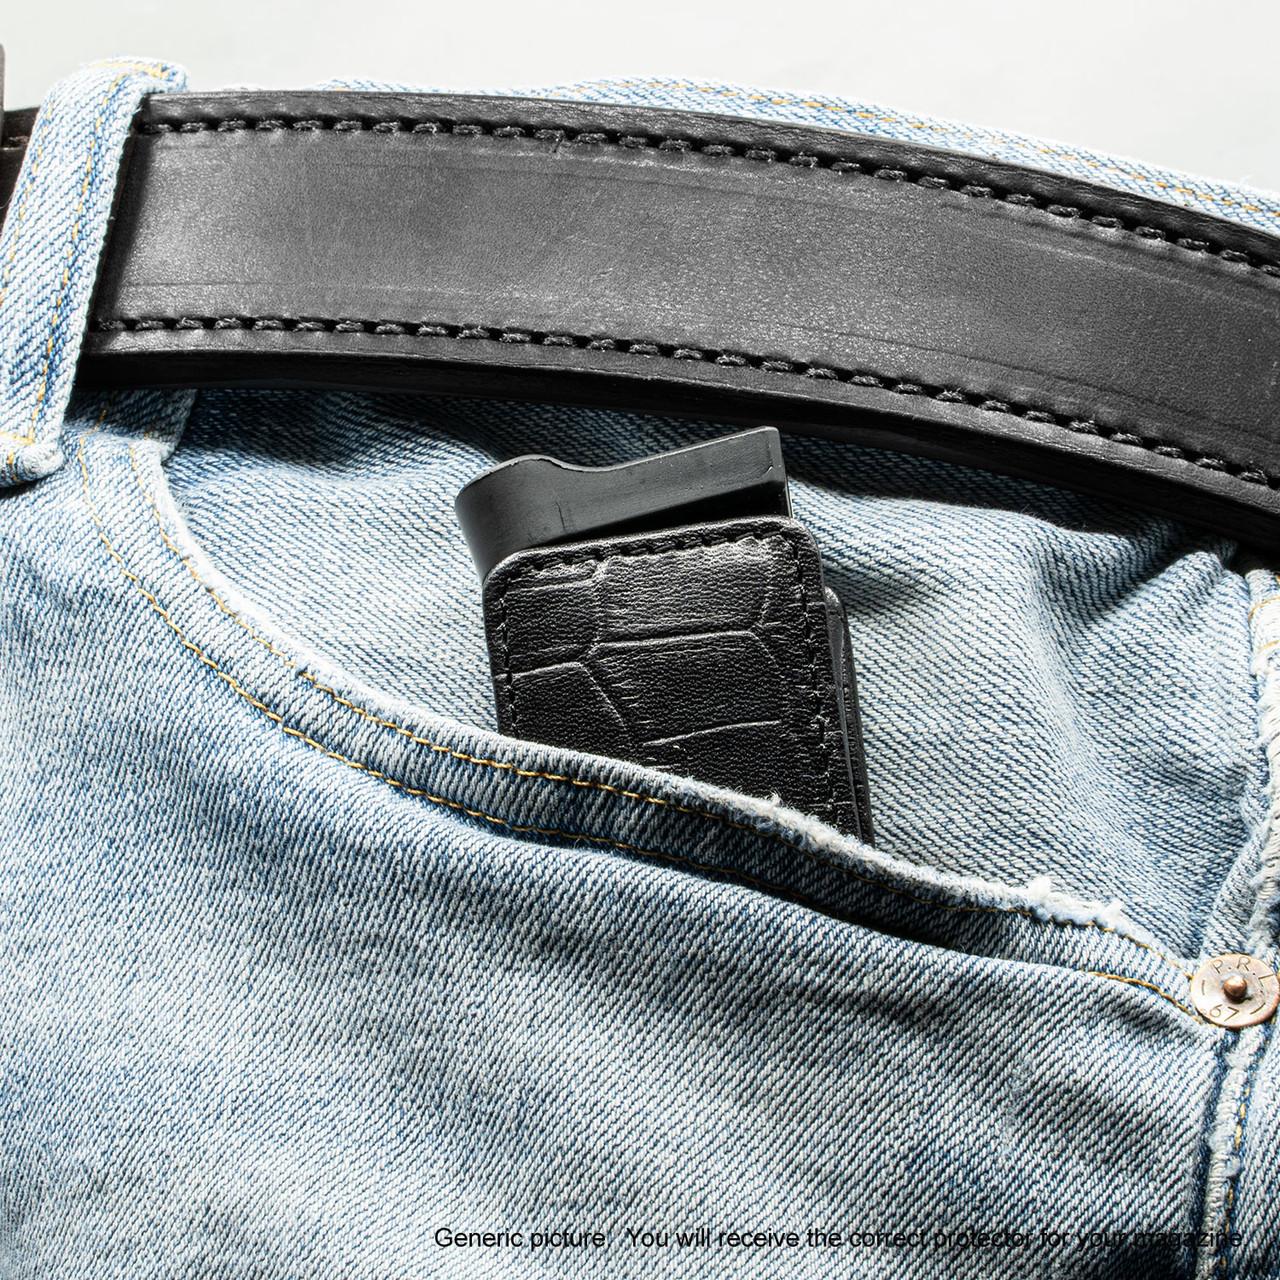 Kahr CM9 Black Alligator Magazine Pocket Protector